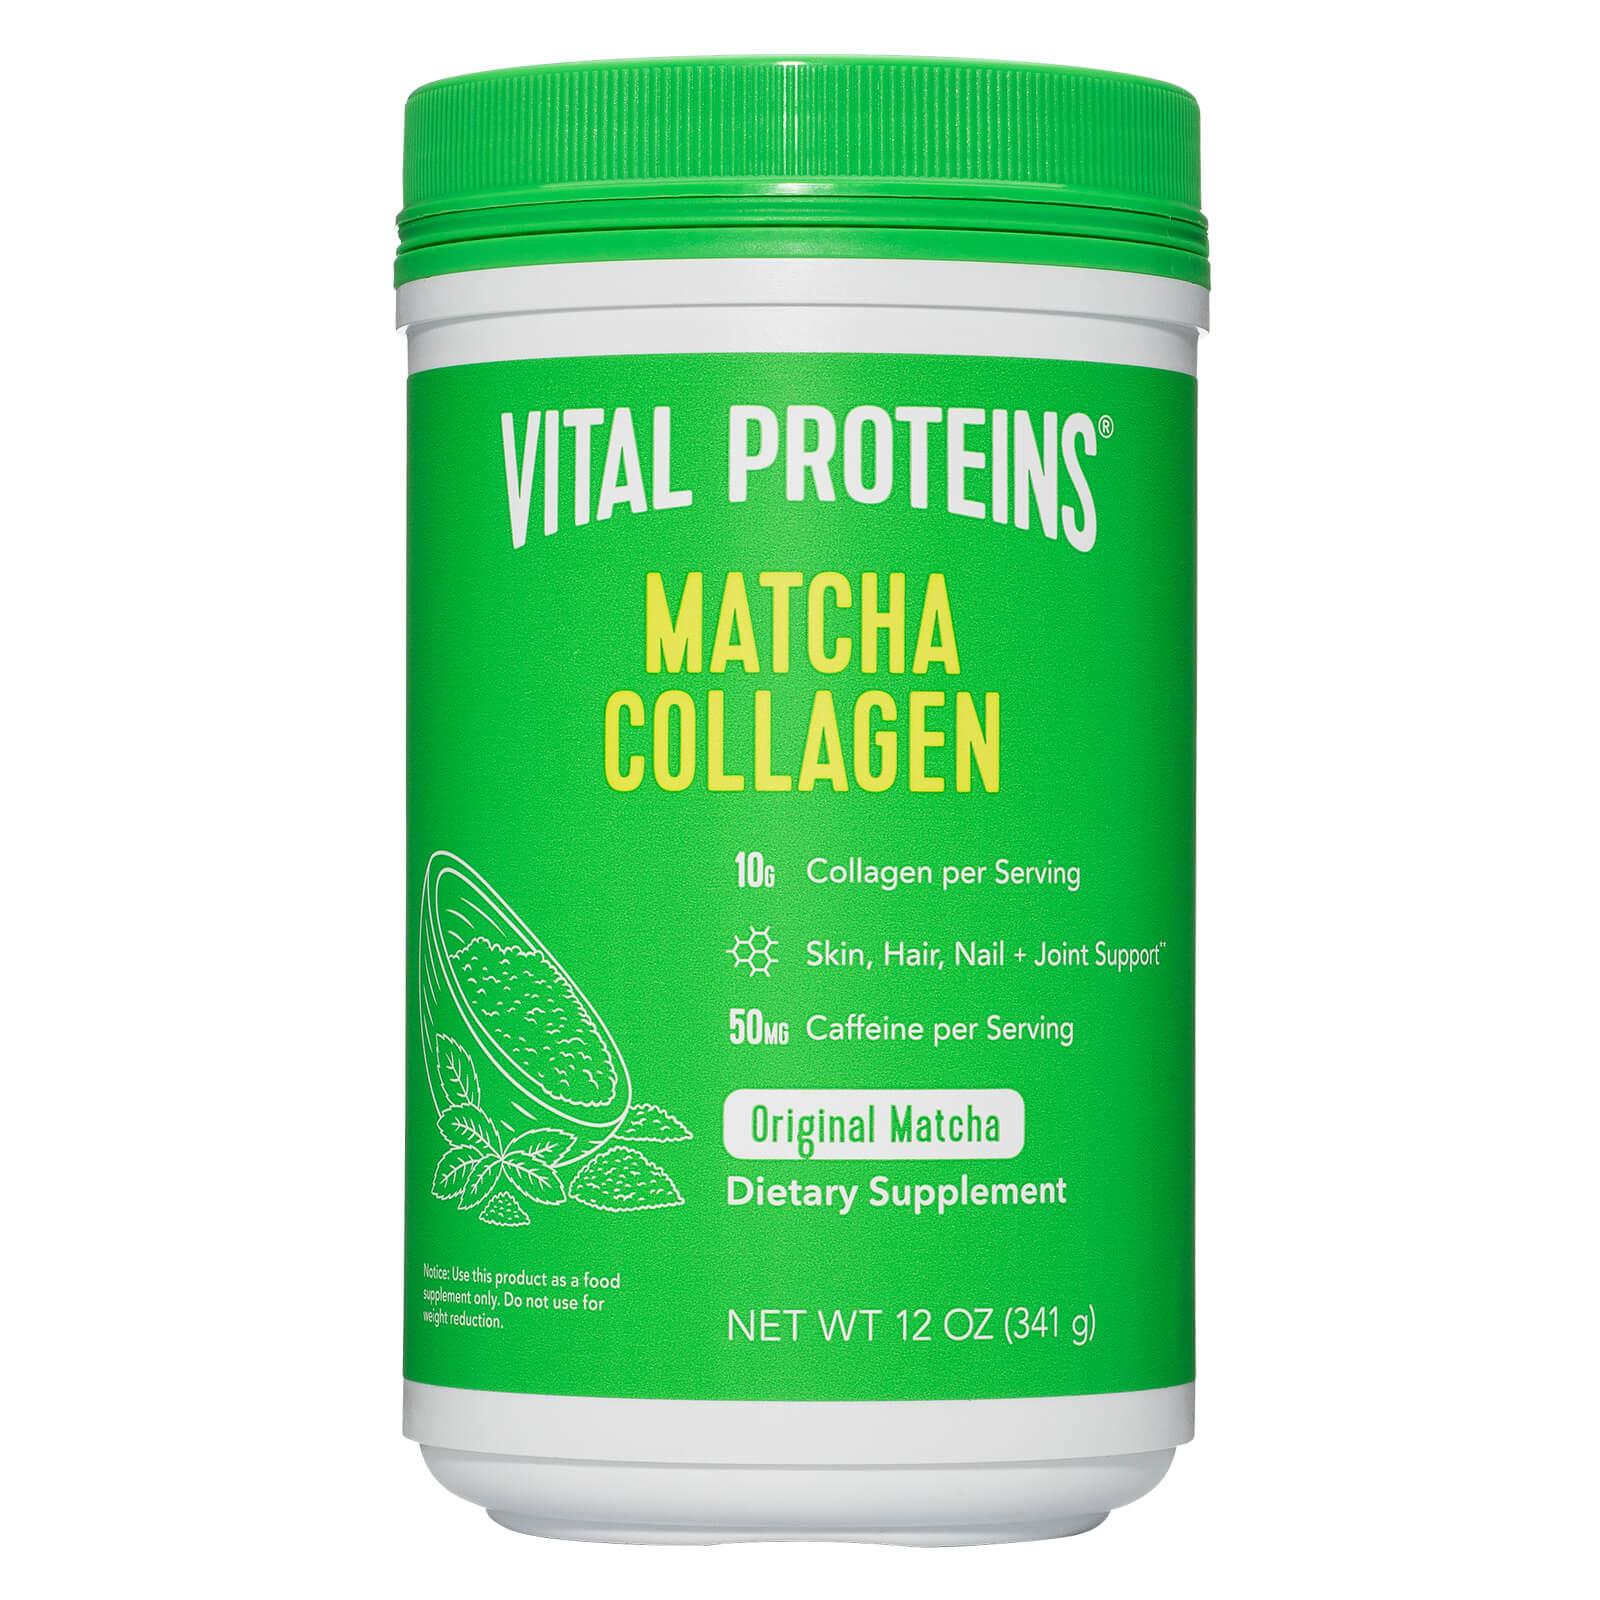 Matcha Collagen - Original Matcha Powder 341g